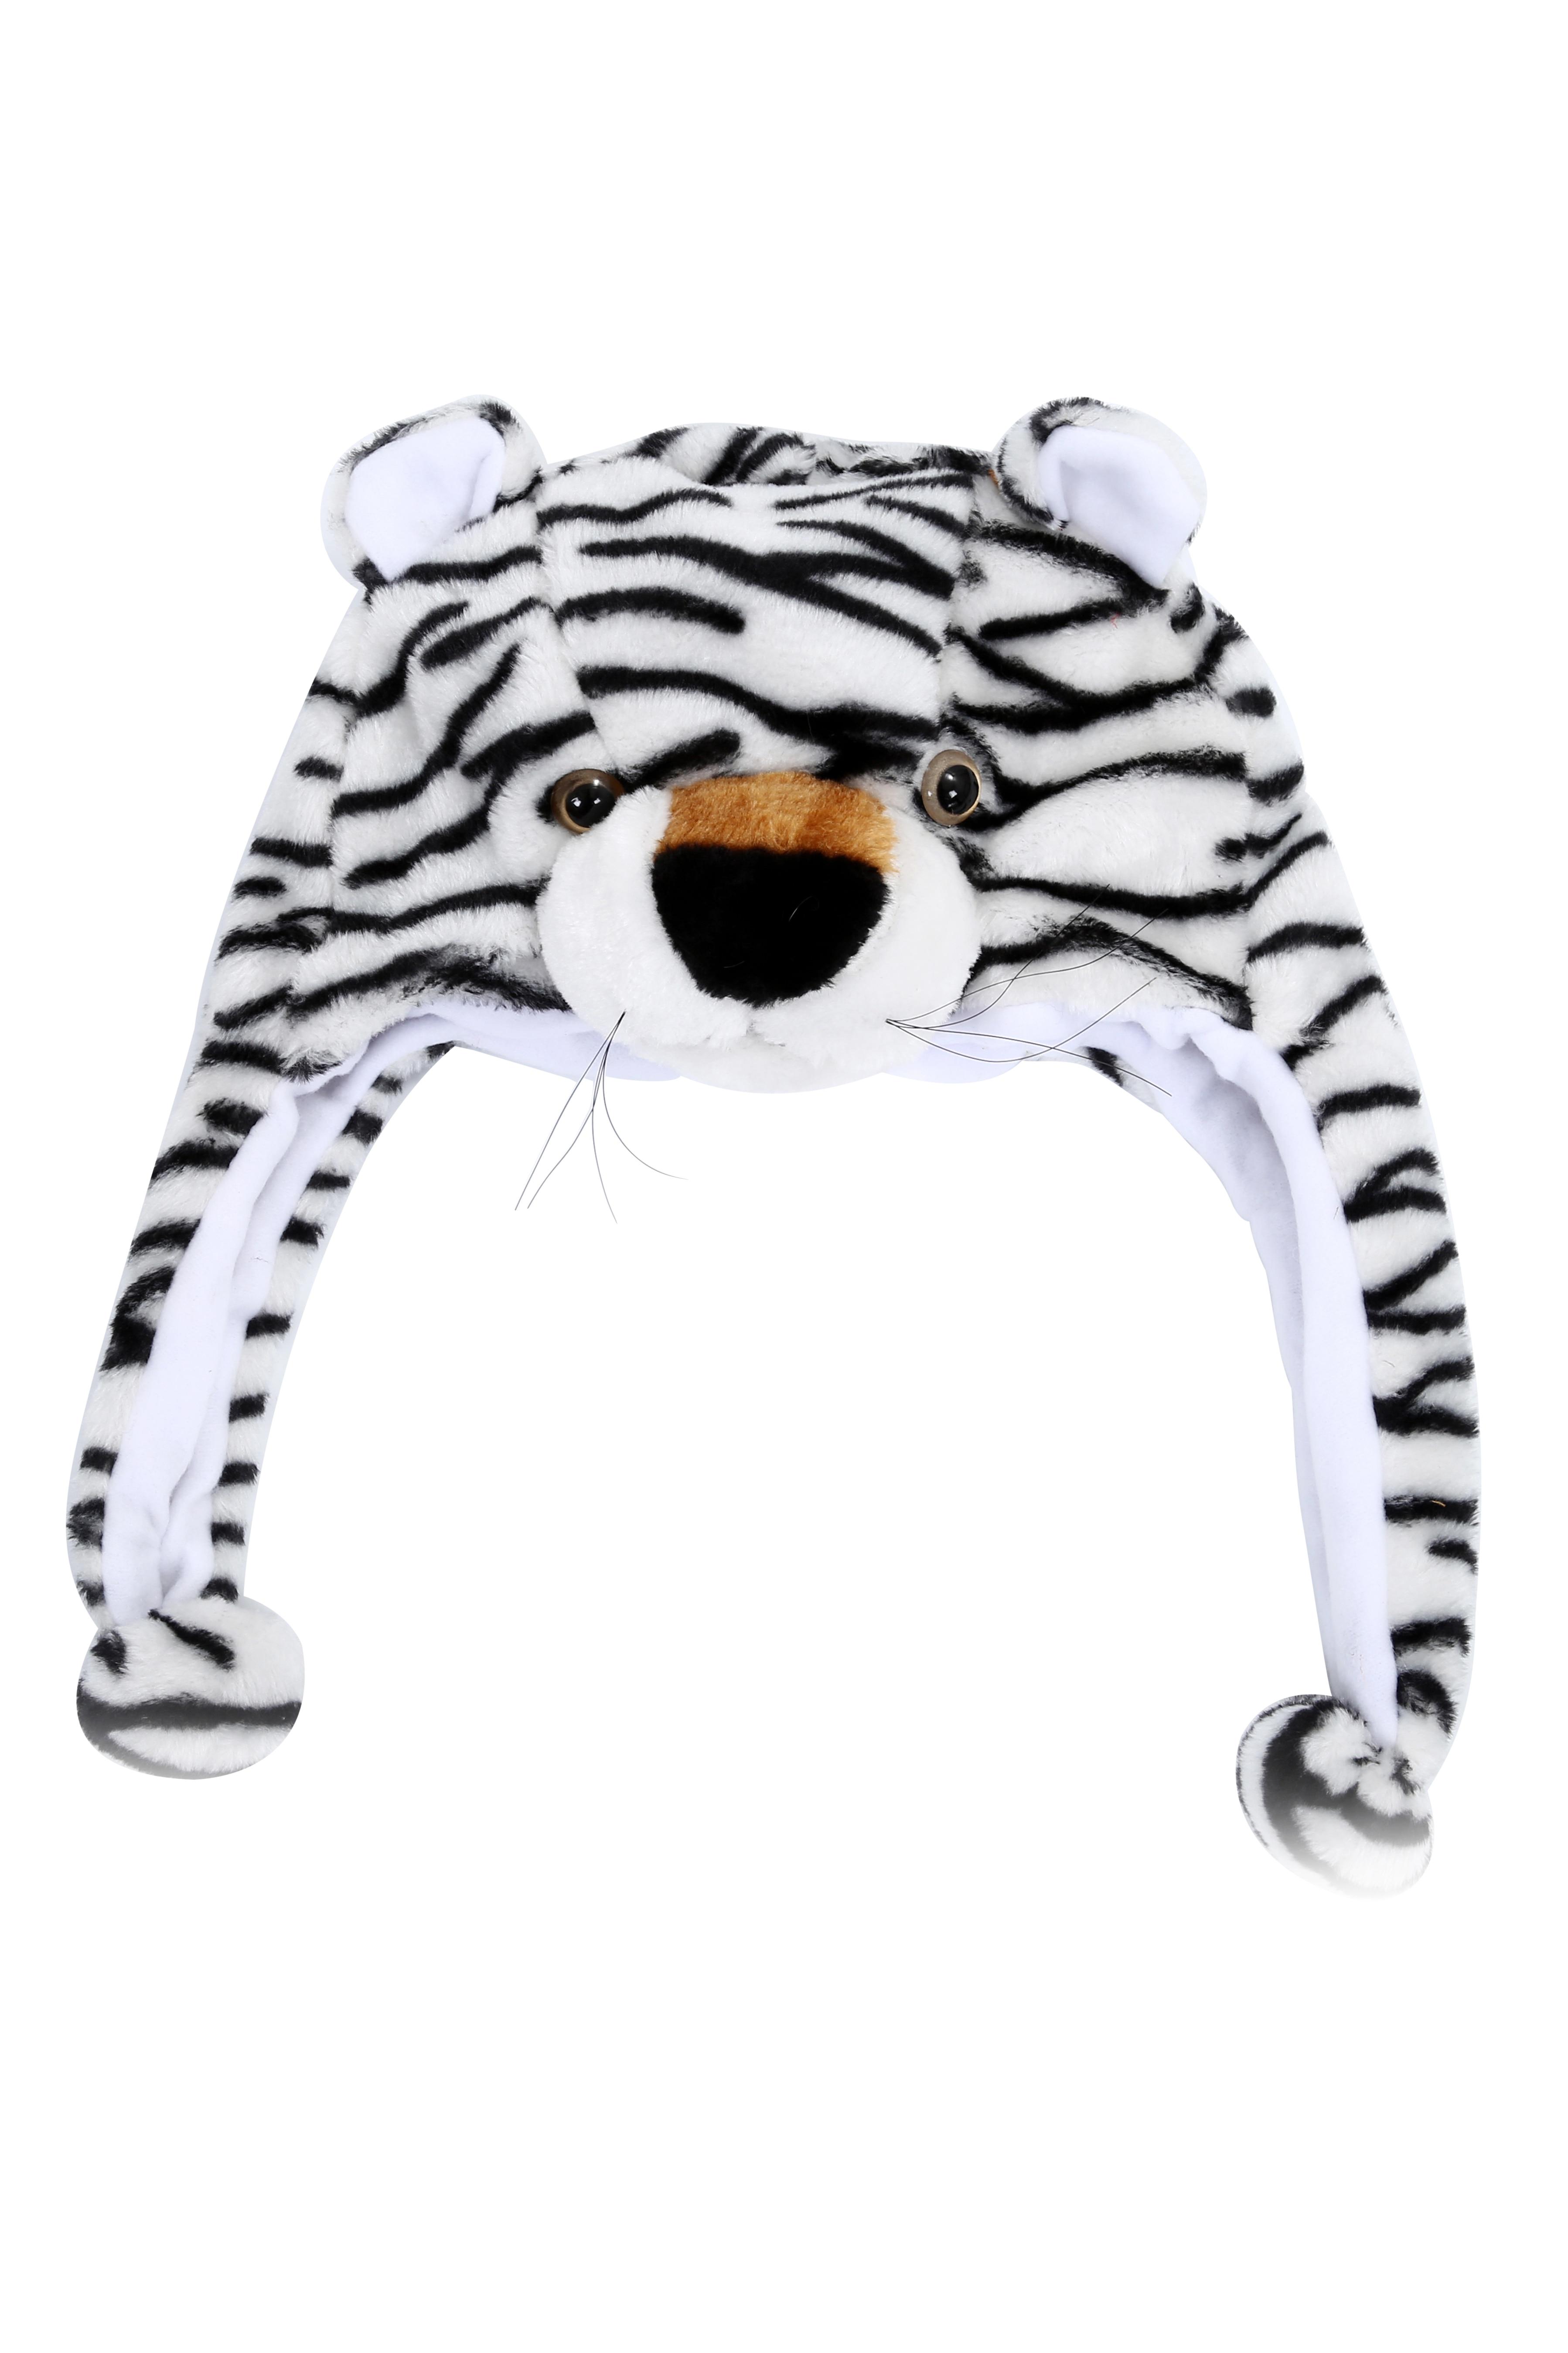 SAF Animal Hat With Scarf Faux Fur Kids Winter Hat White Tiger-in ... 715b2a5af22